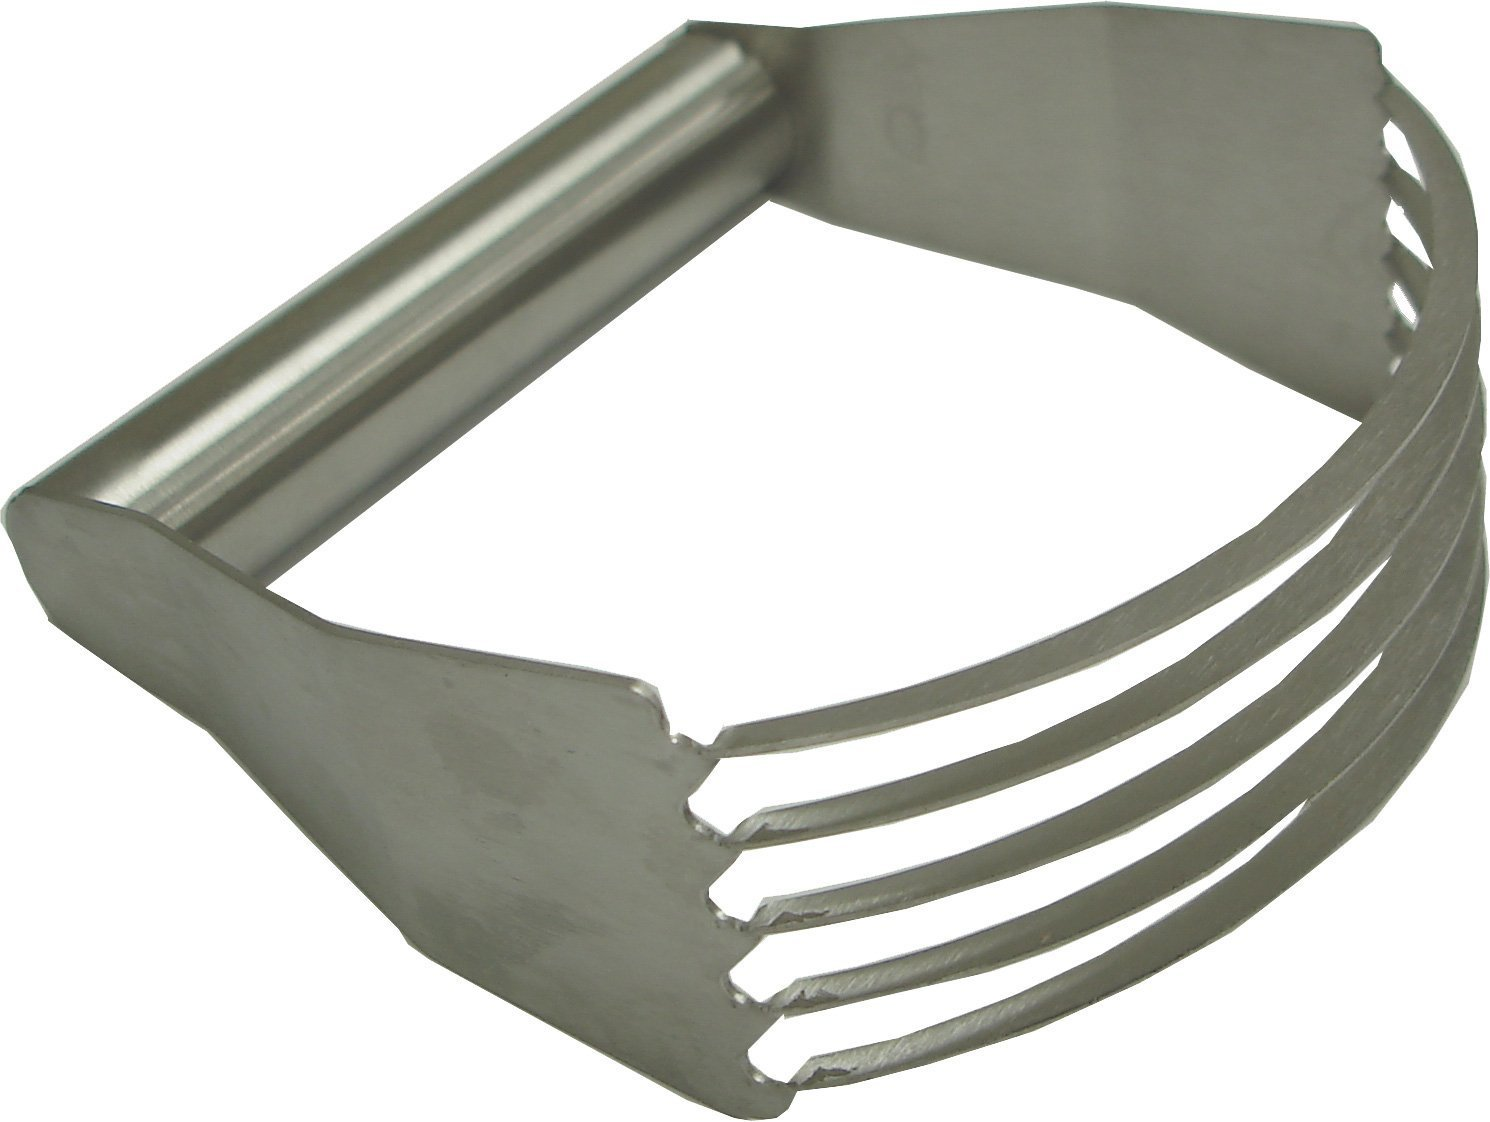 Winco 5 Blade Pastry Blender, Stainless Steel (3)